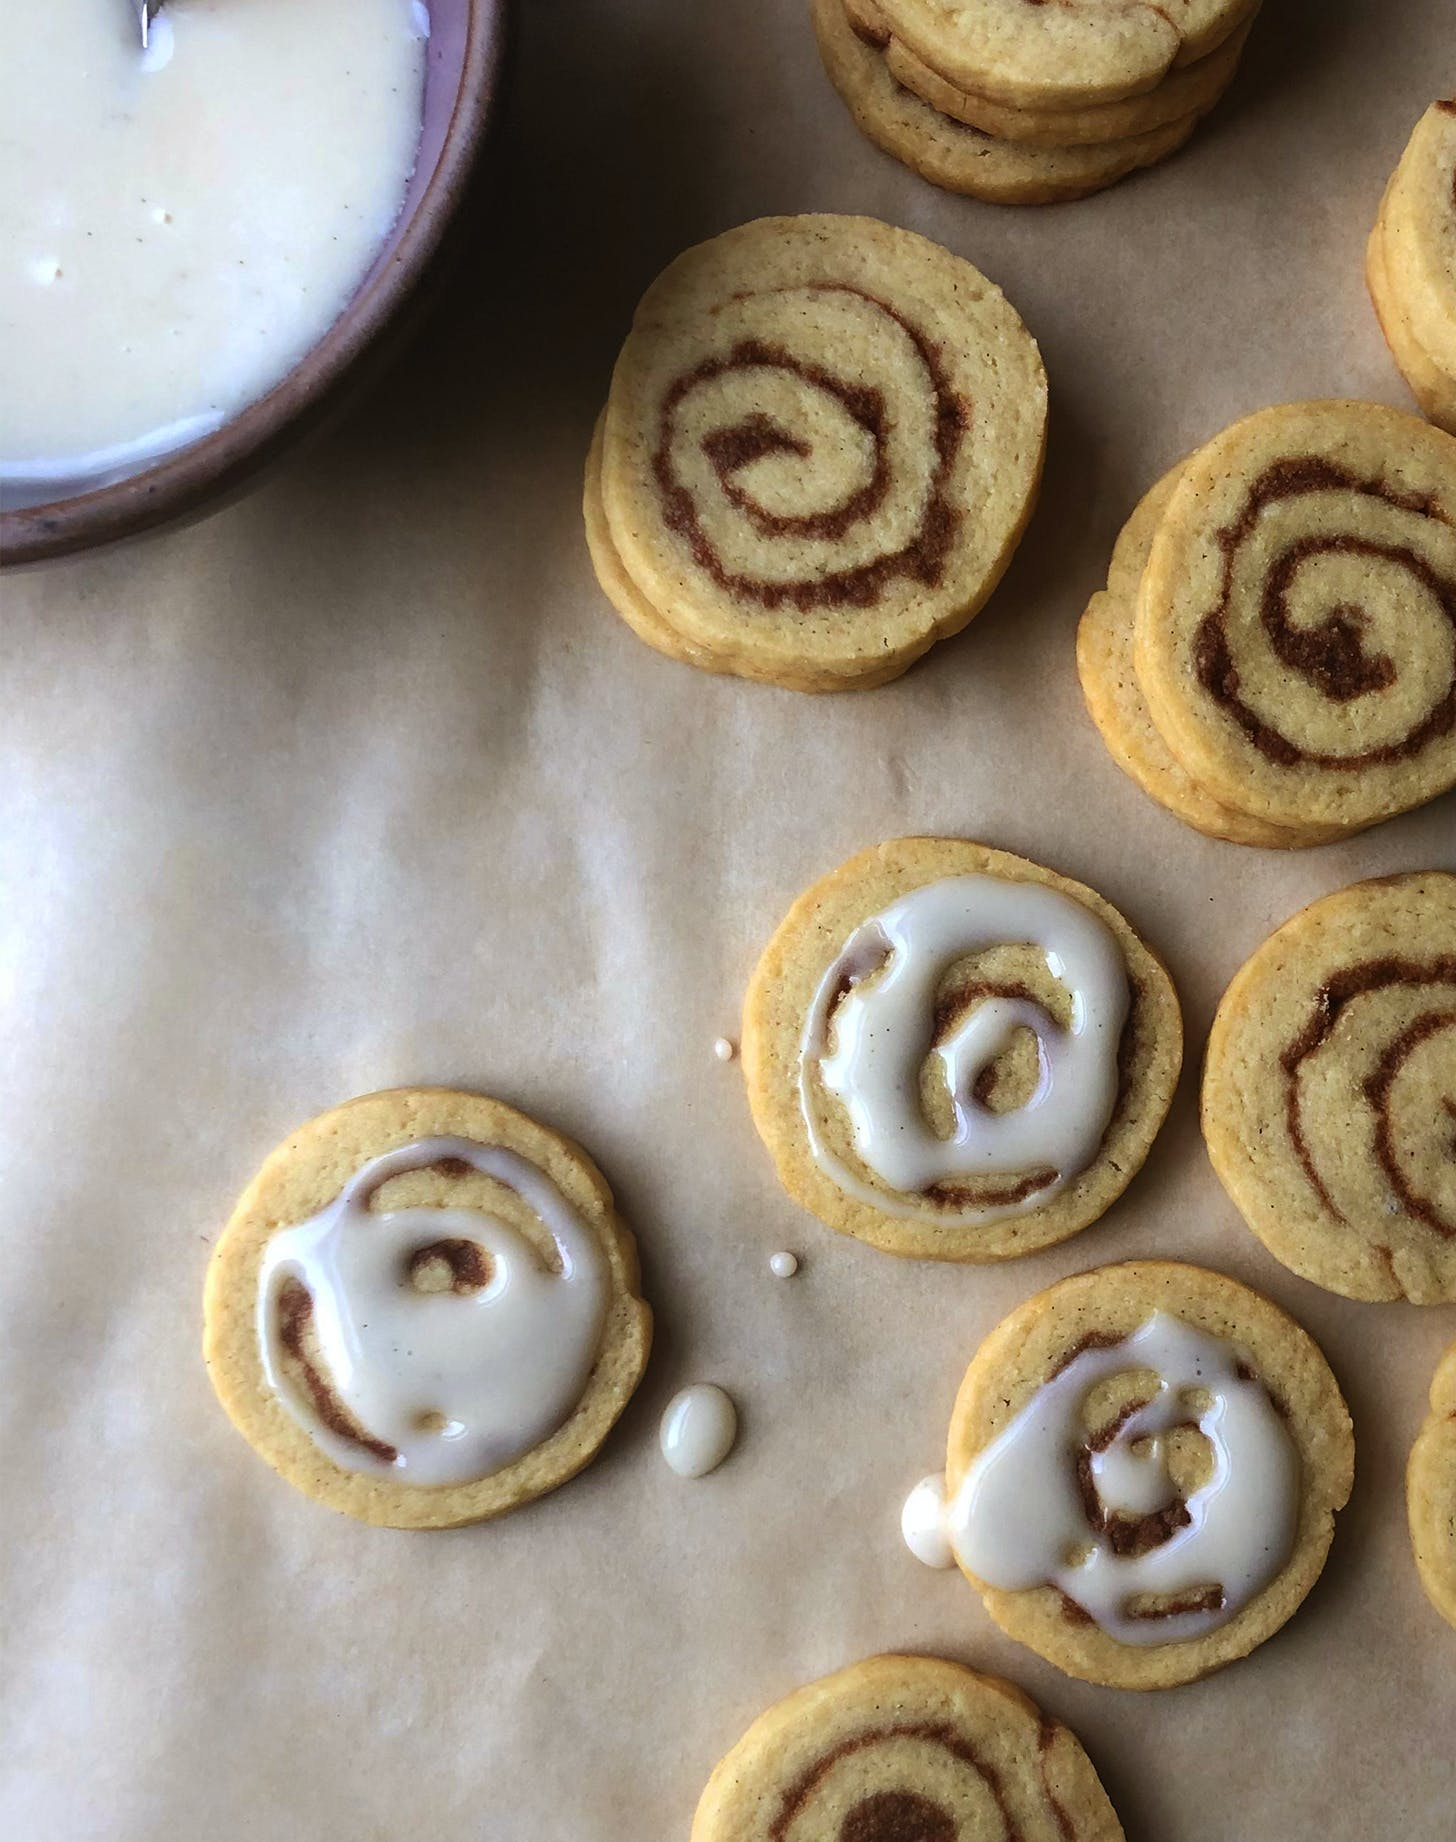 Cinnamon-Roll Cookies with Cream Cheese Glaze